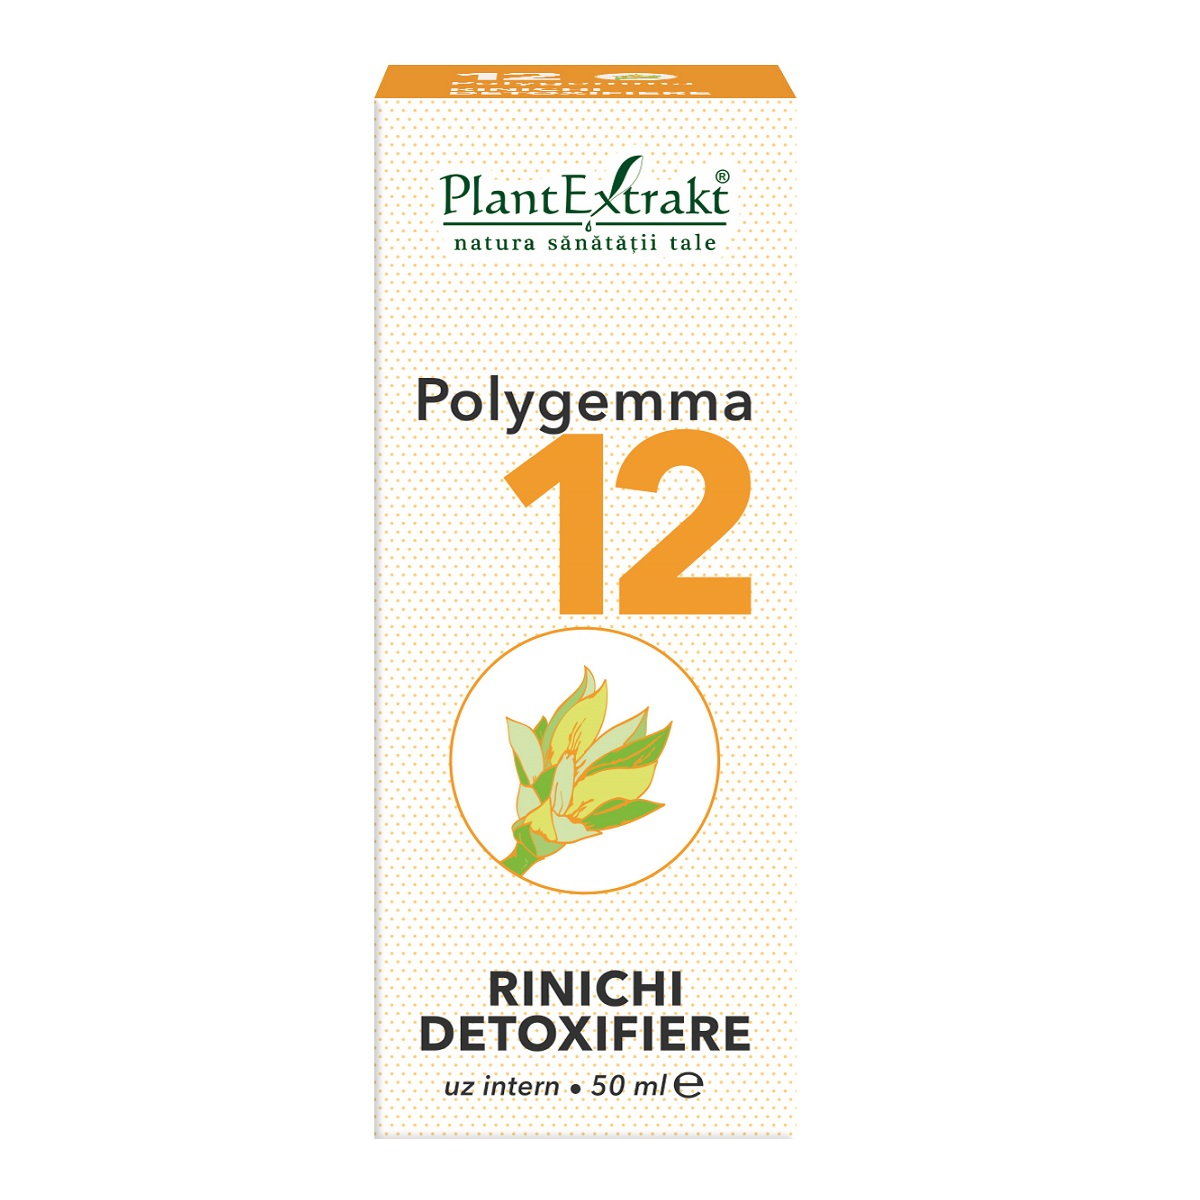 Polygemma 12, Rinichi detoxifiere, 50 ml, Plant Extrakt